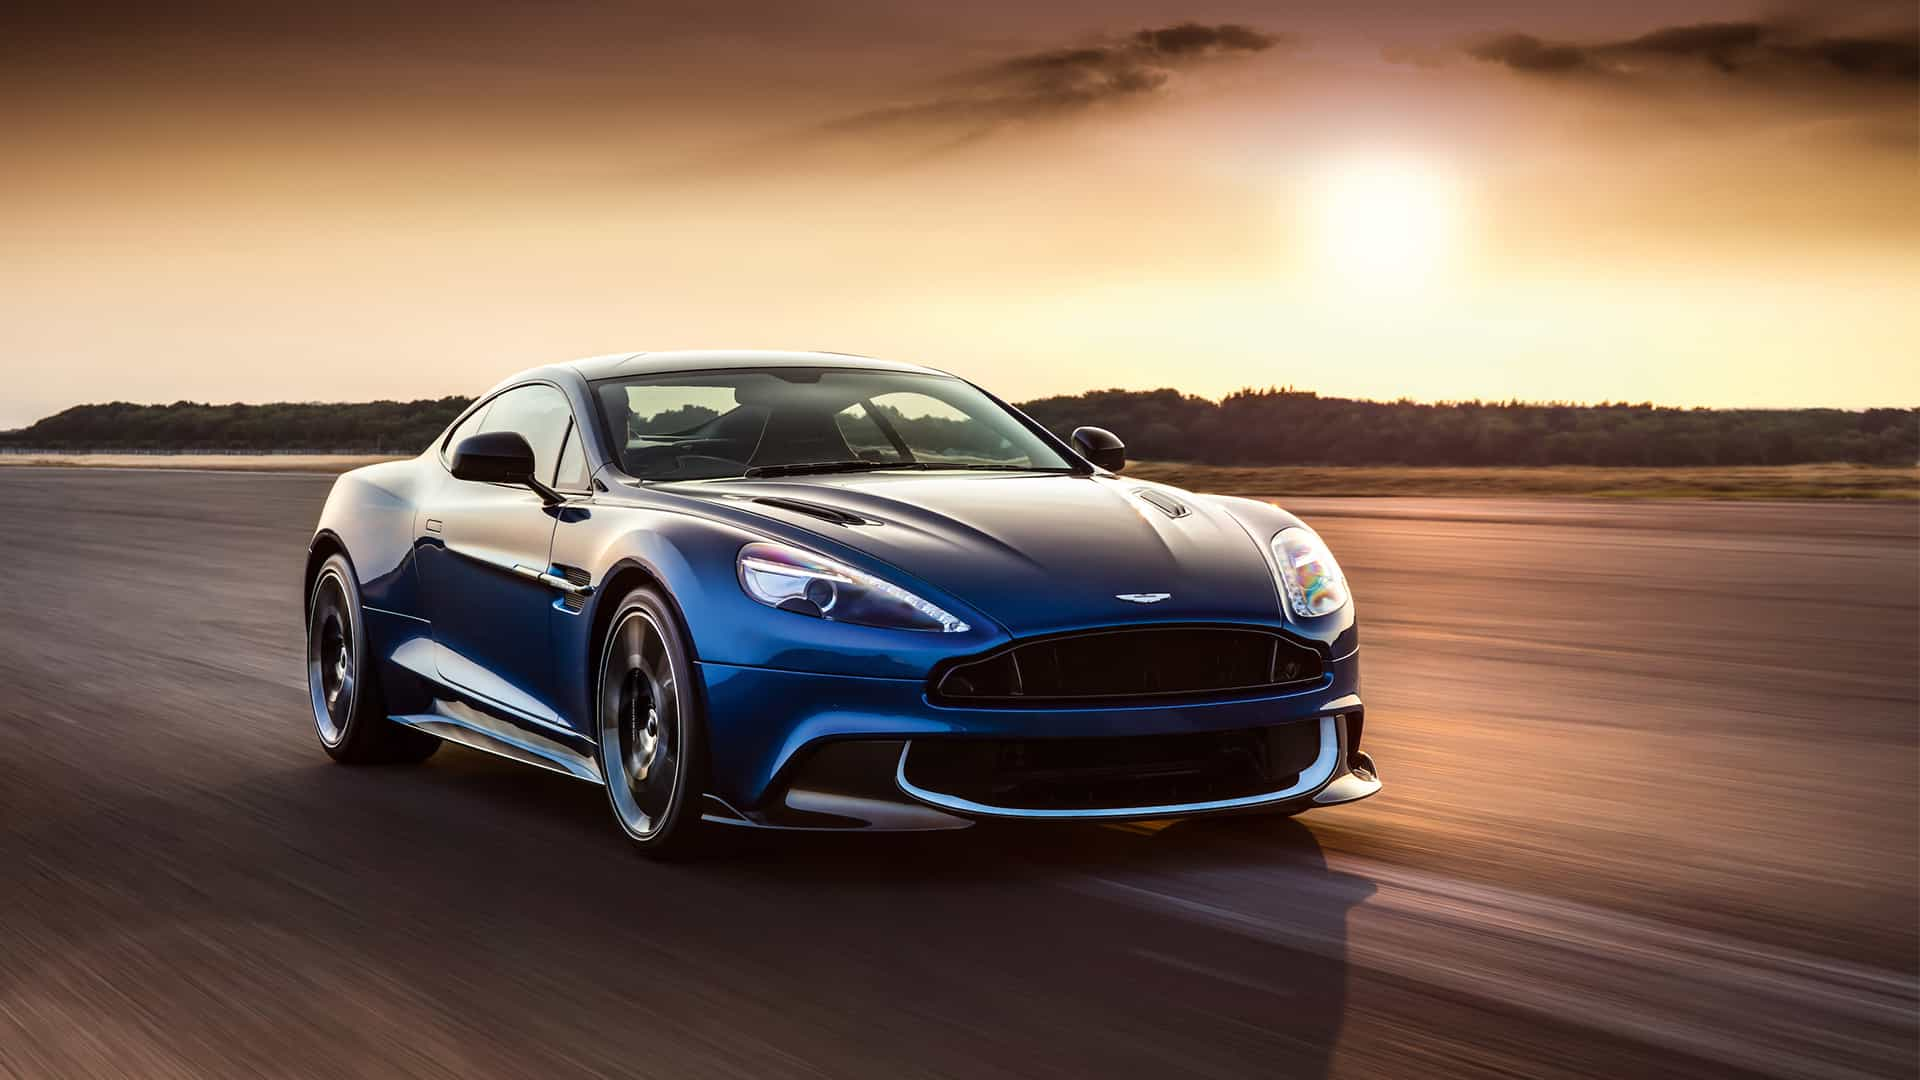 Vanquish S: Aston Martin's take on 'ultimate' Super GT